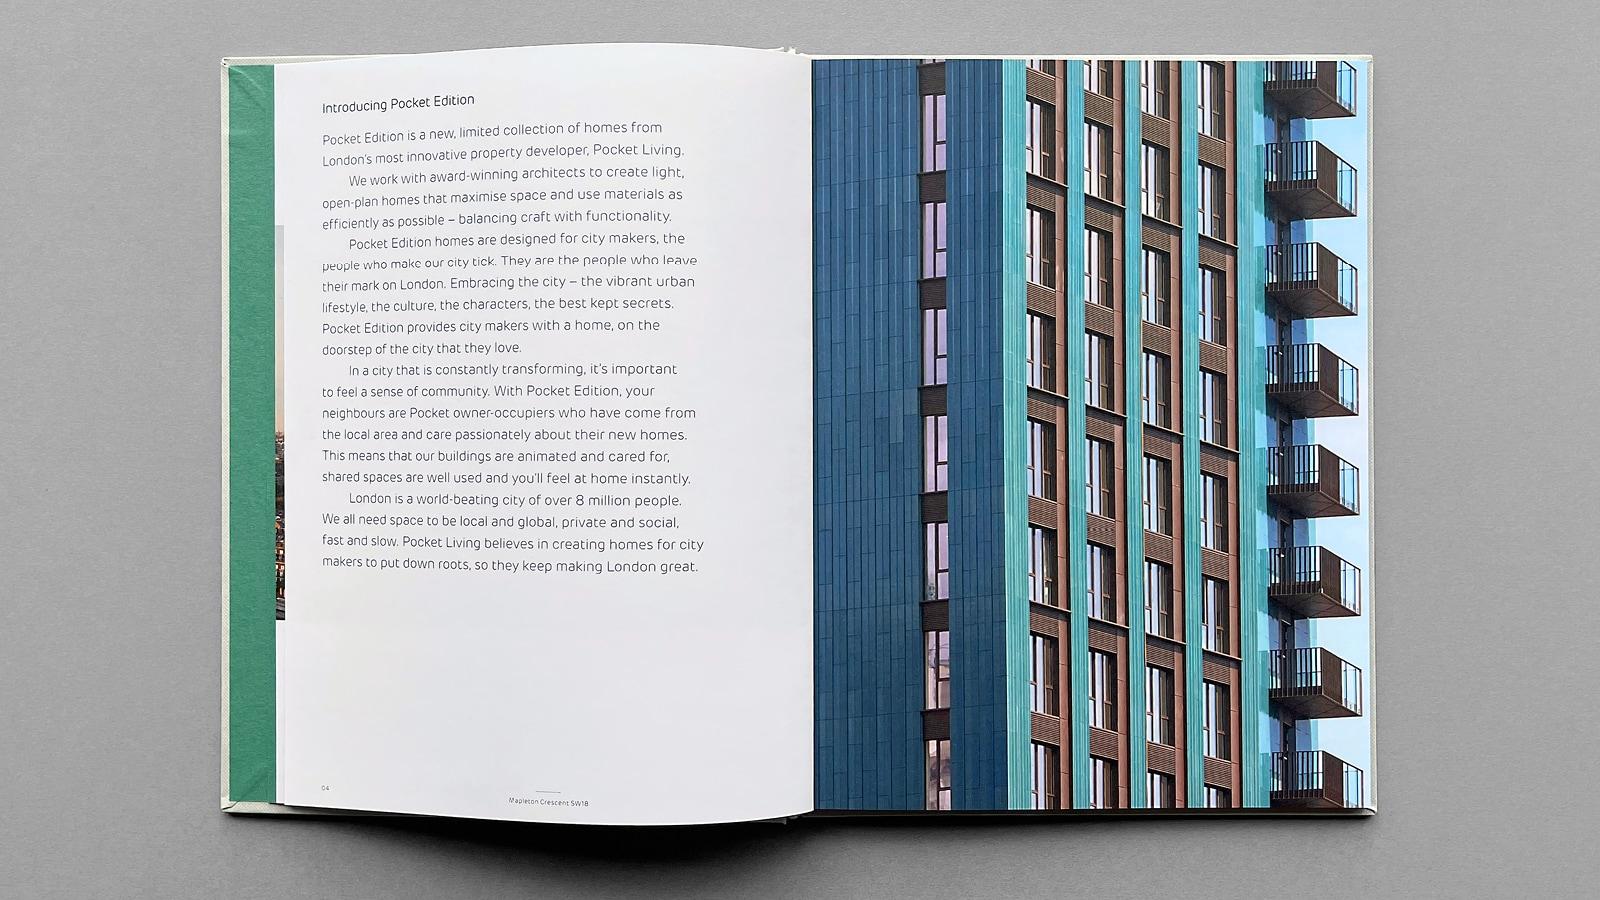 property-marketing-design-architecture-building-book-brochure-milton-keynes-london4